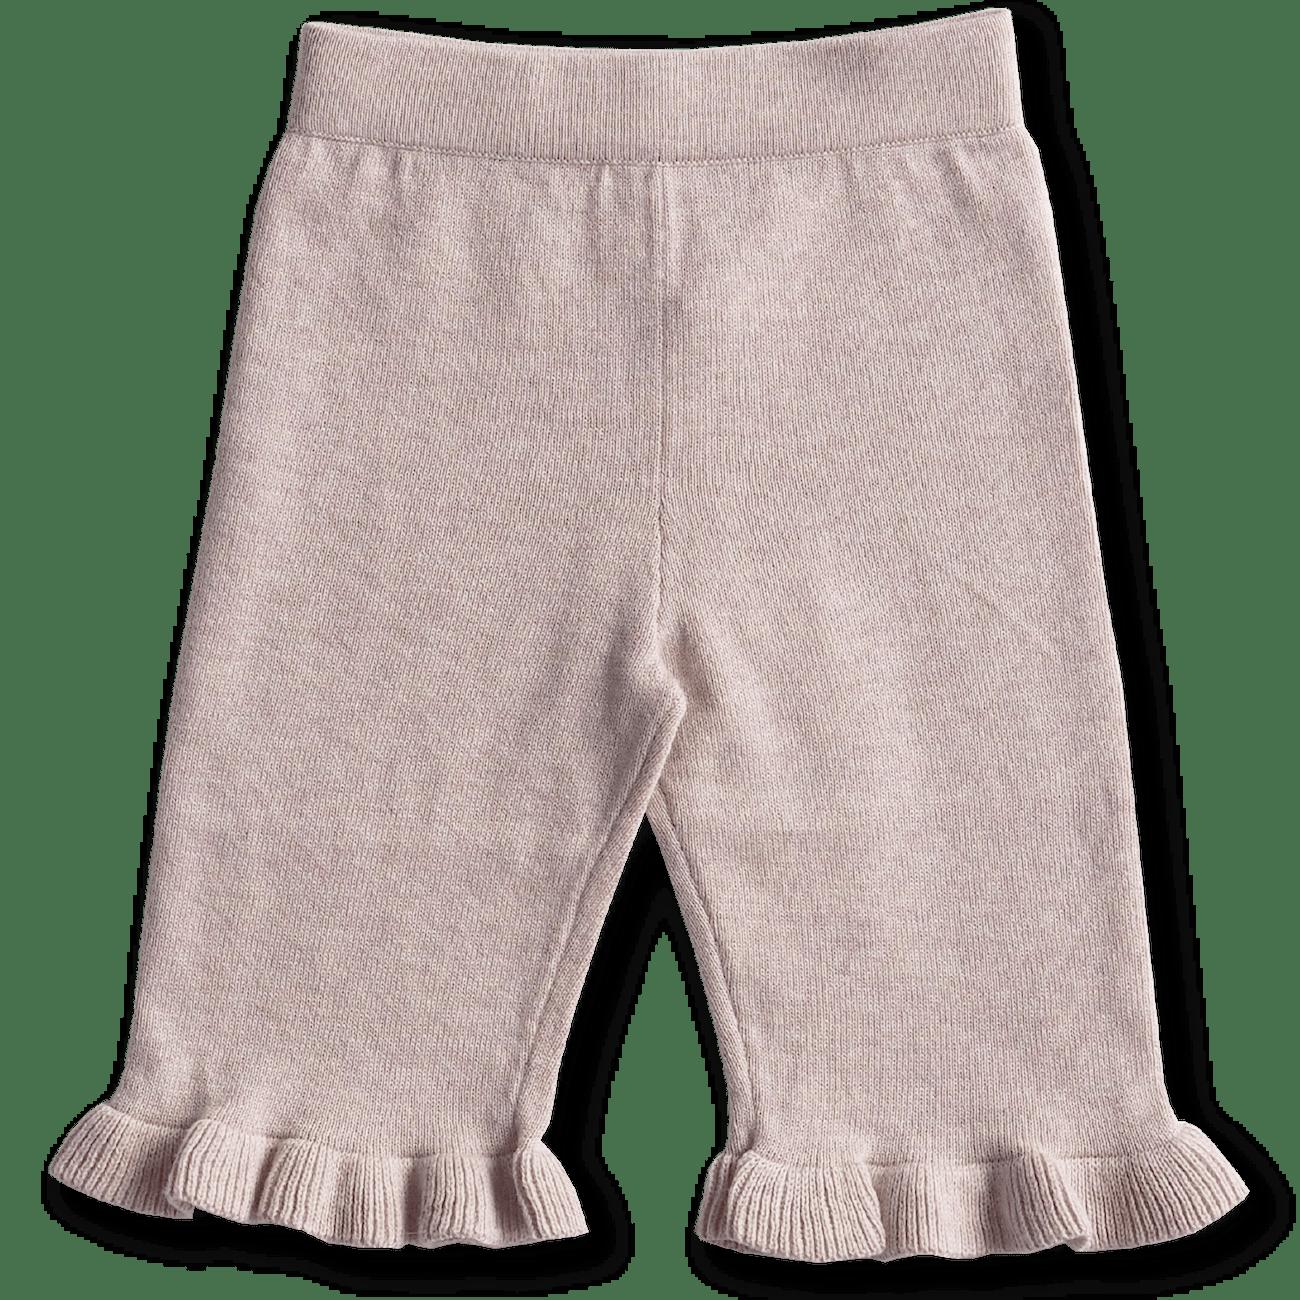 Grown Frill Pant (violet marle)